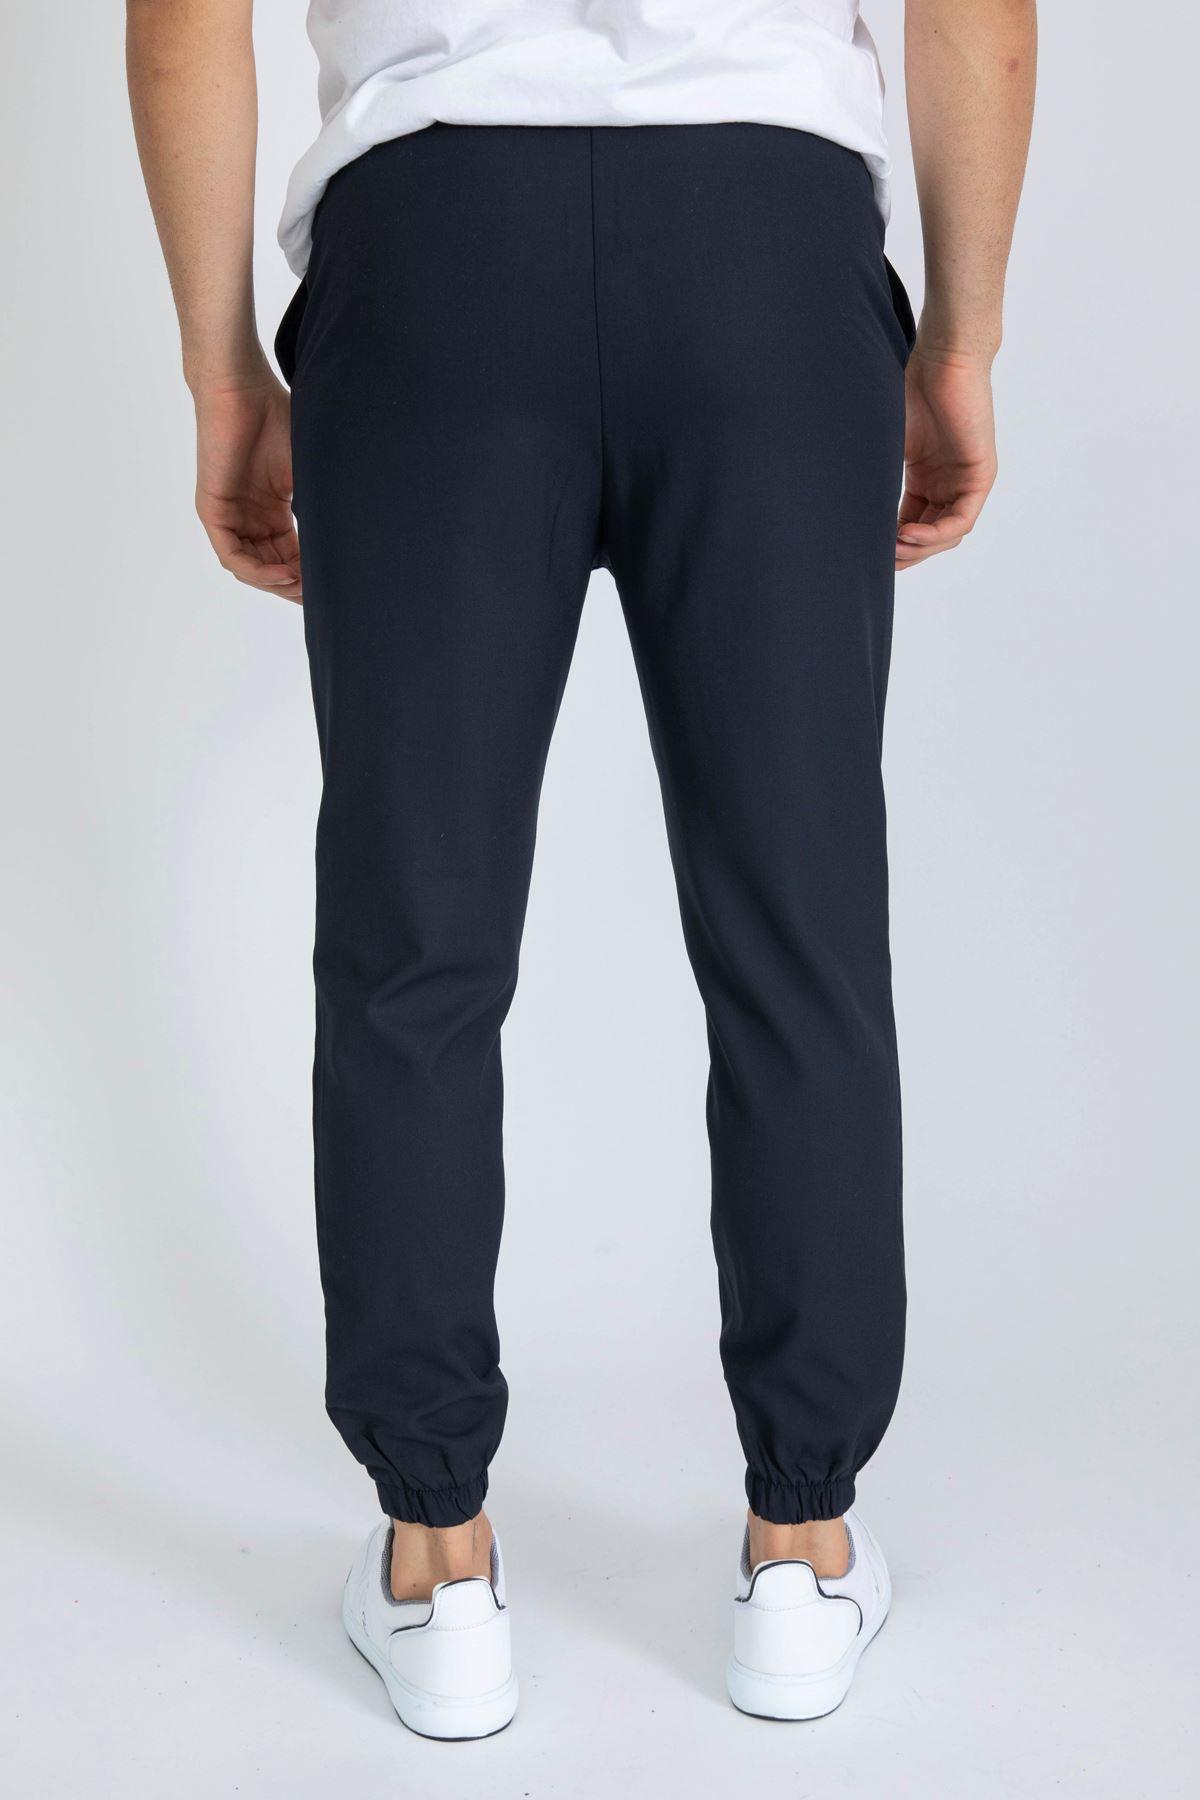 Erkek Paça Lastikli Lacivert Dalgıç Pantolon